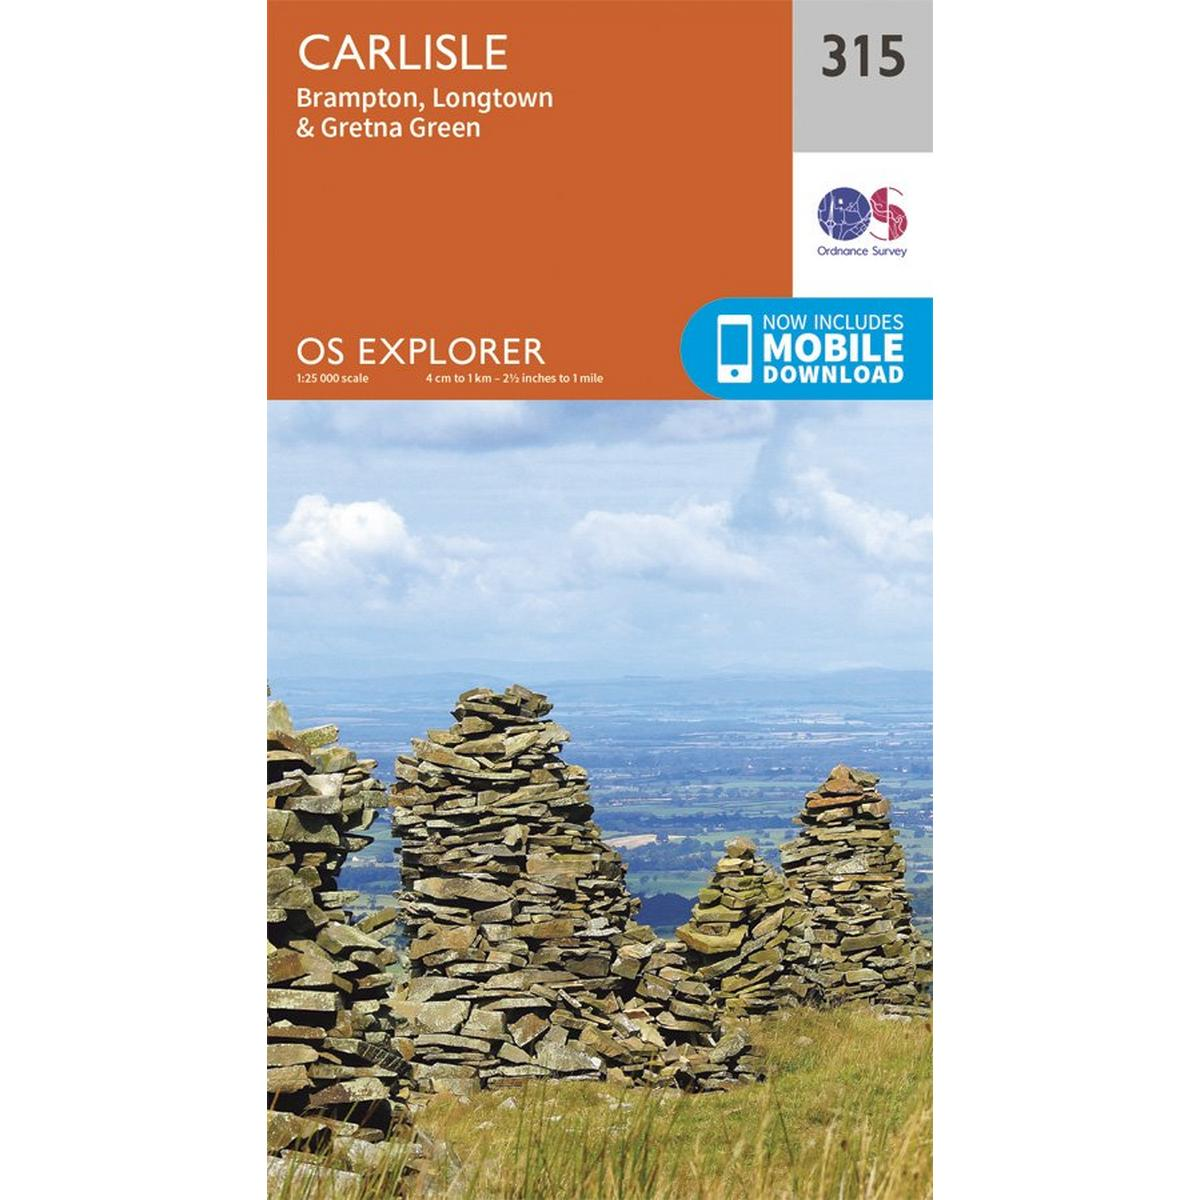 Ordnance Survey OS Explorer Map 315 Carlisle